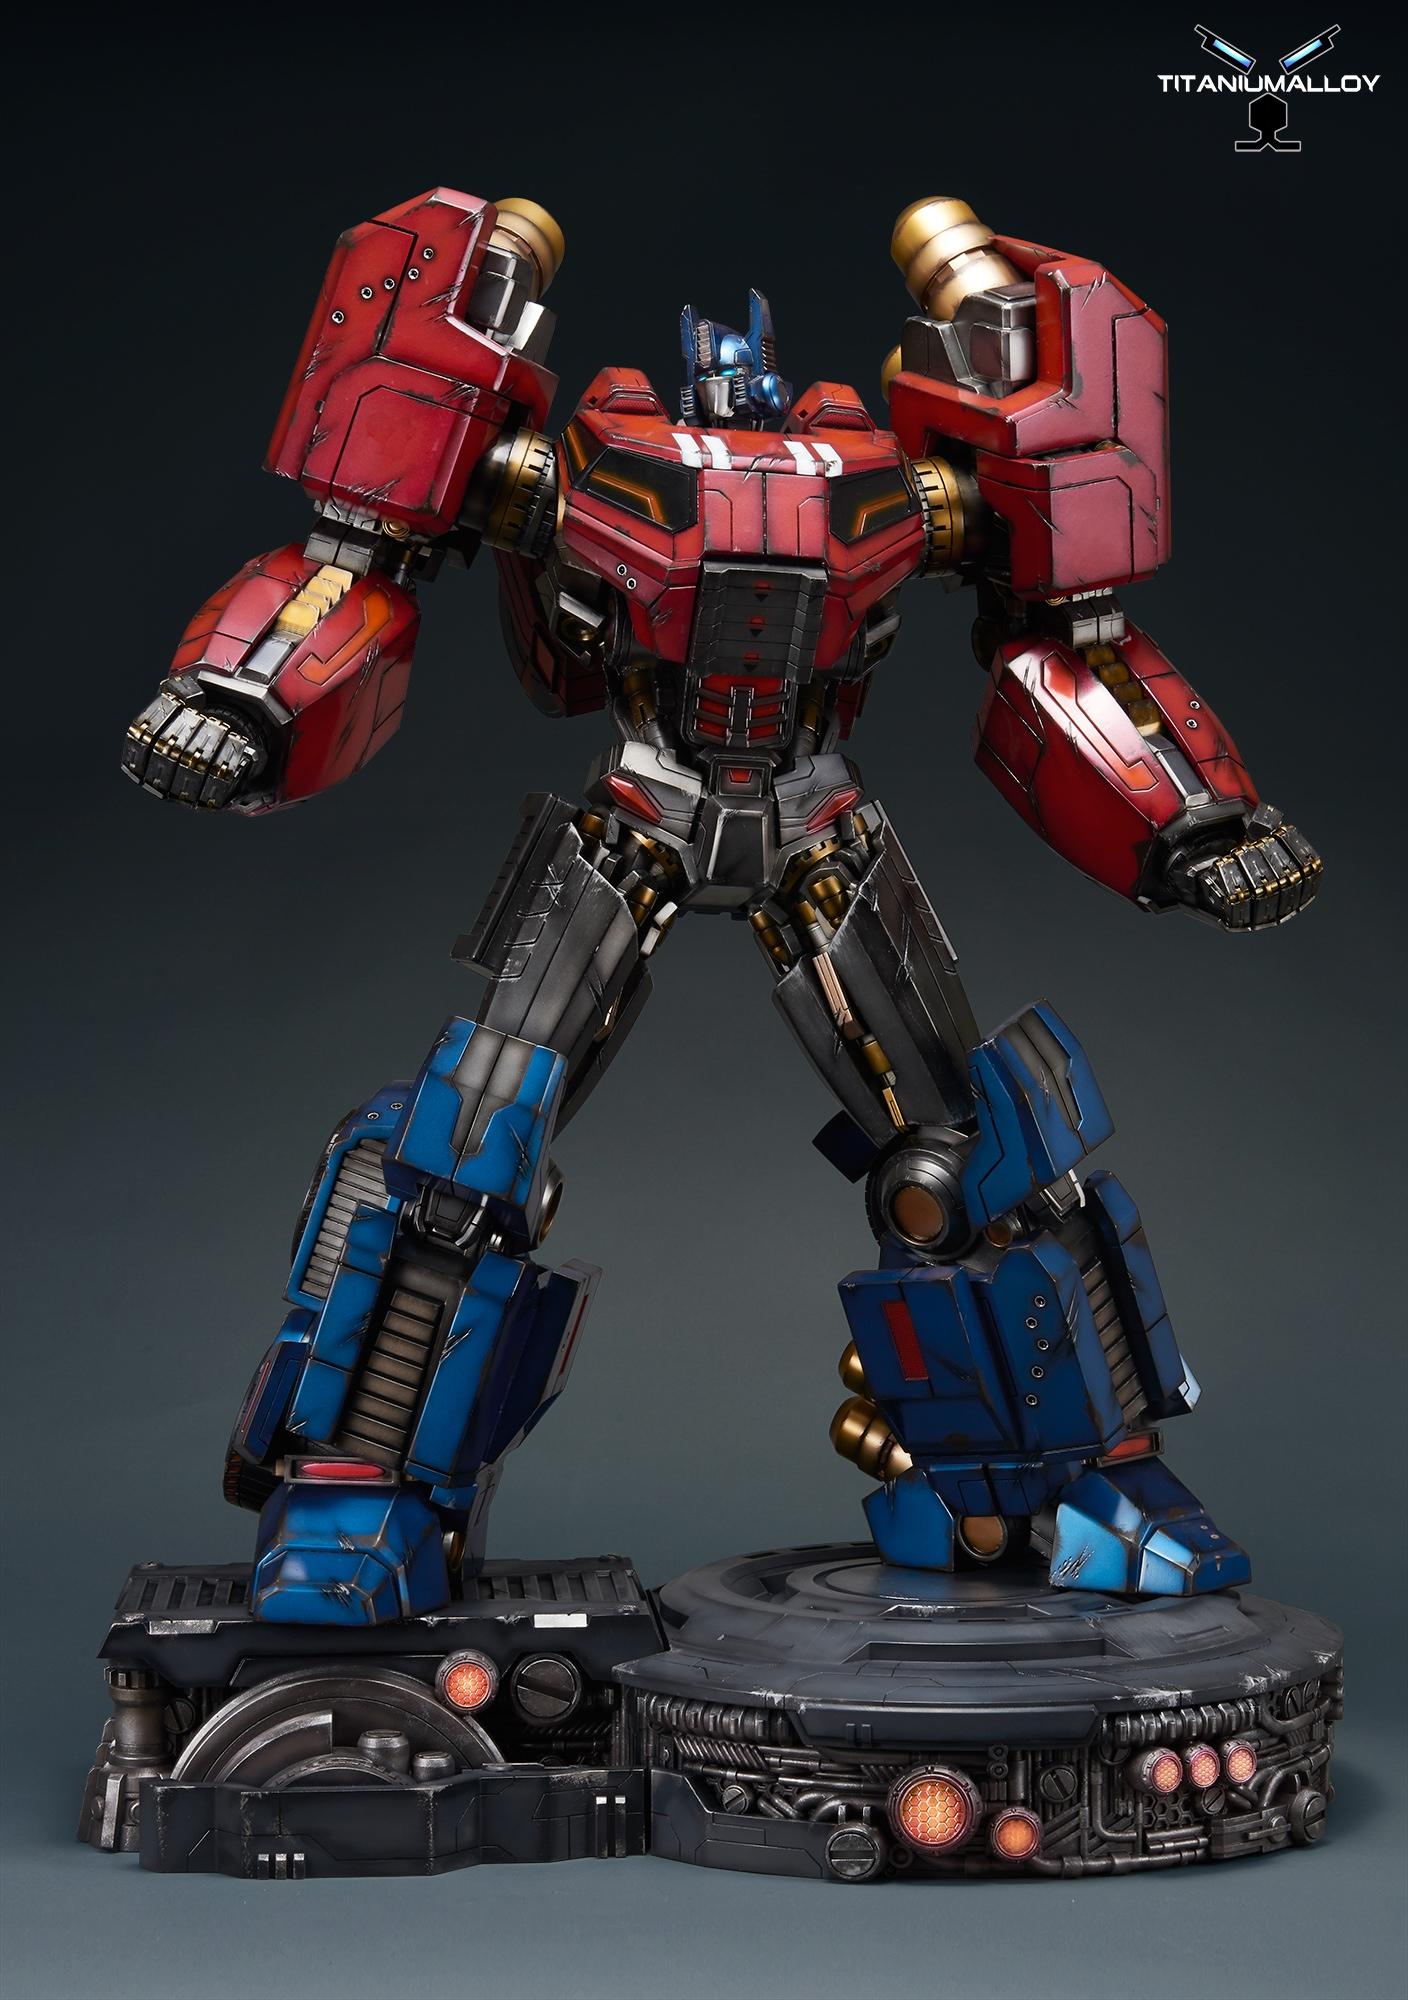 titanium alloy fall of cybertron optimus prime statue